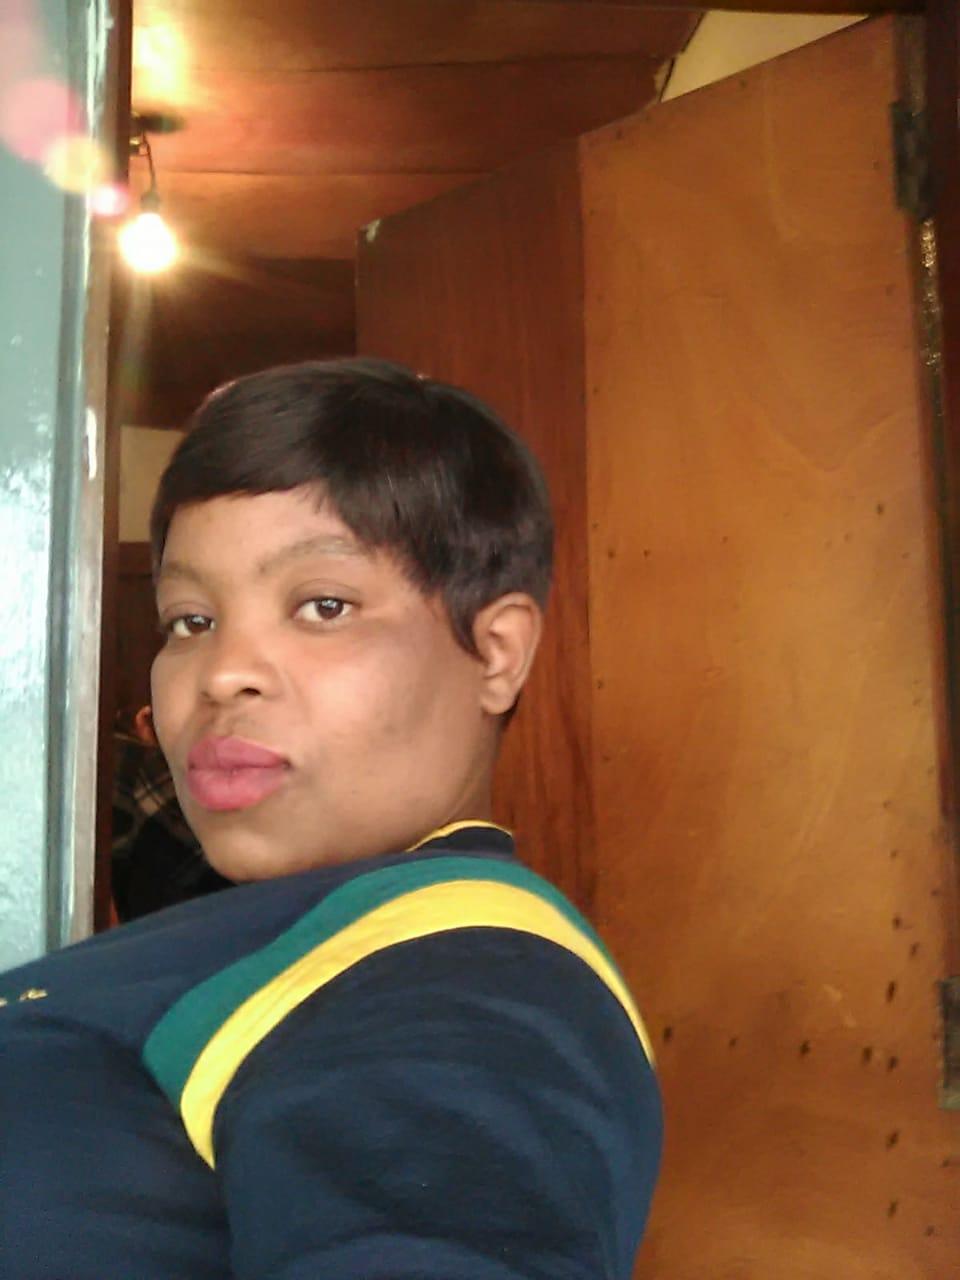 ZIMBABWEAN MAID available